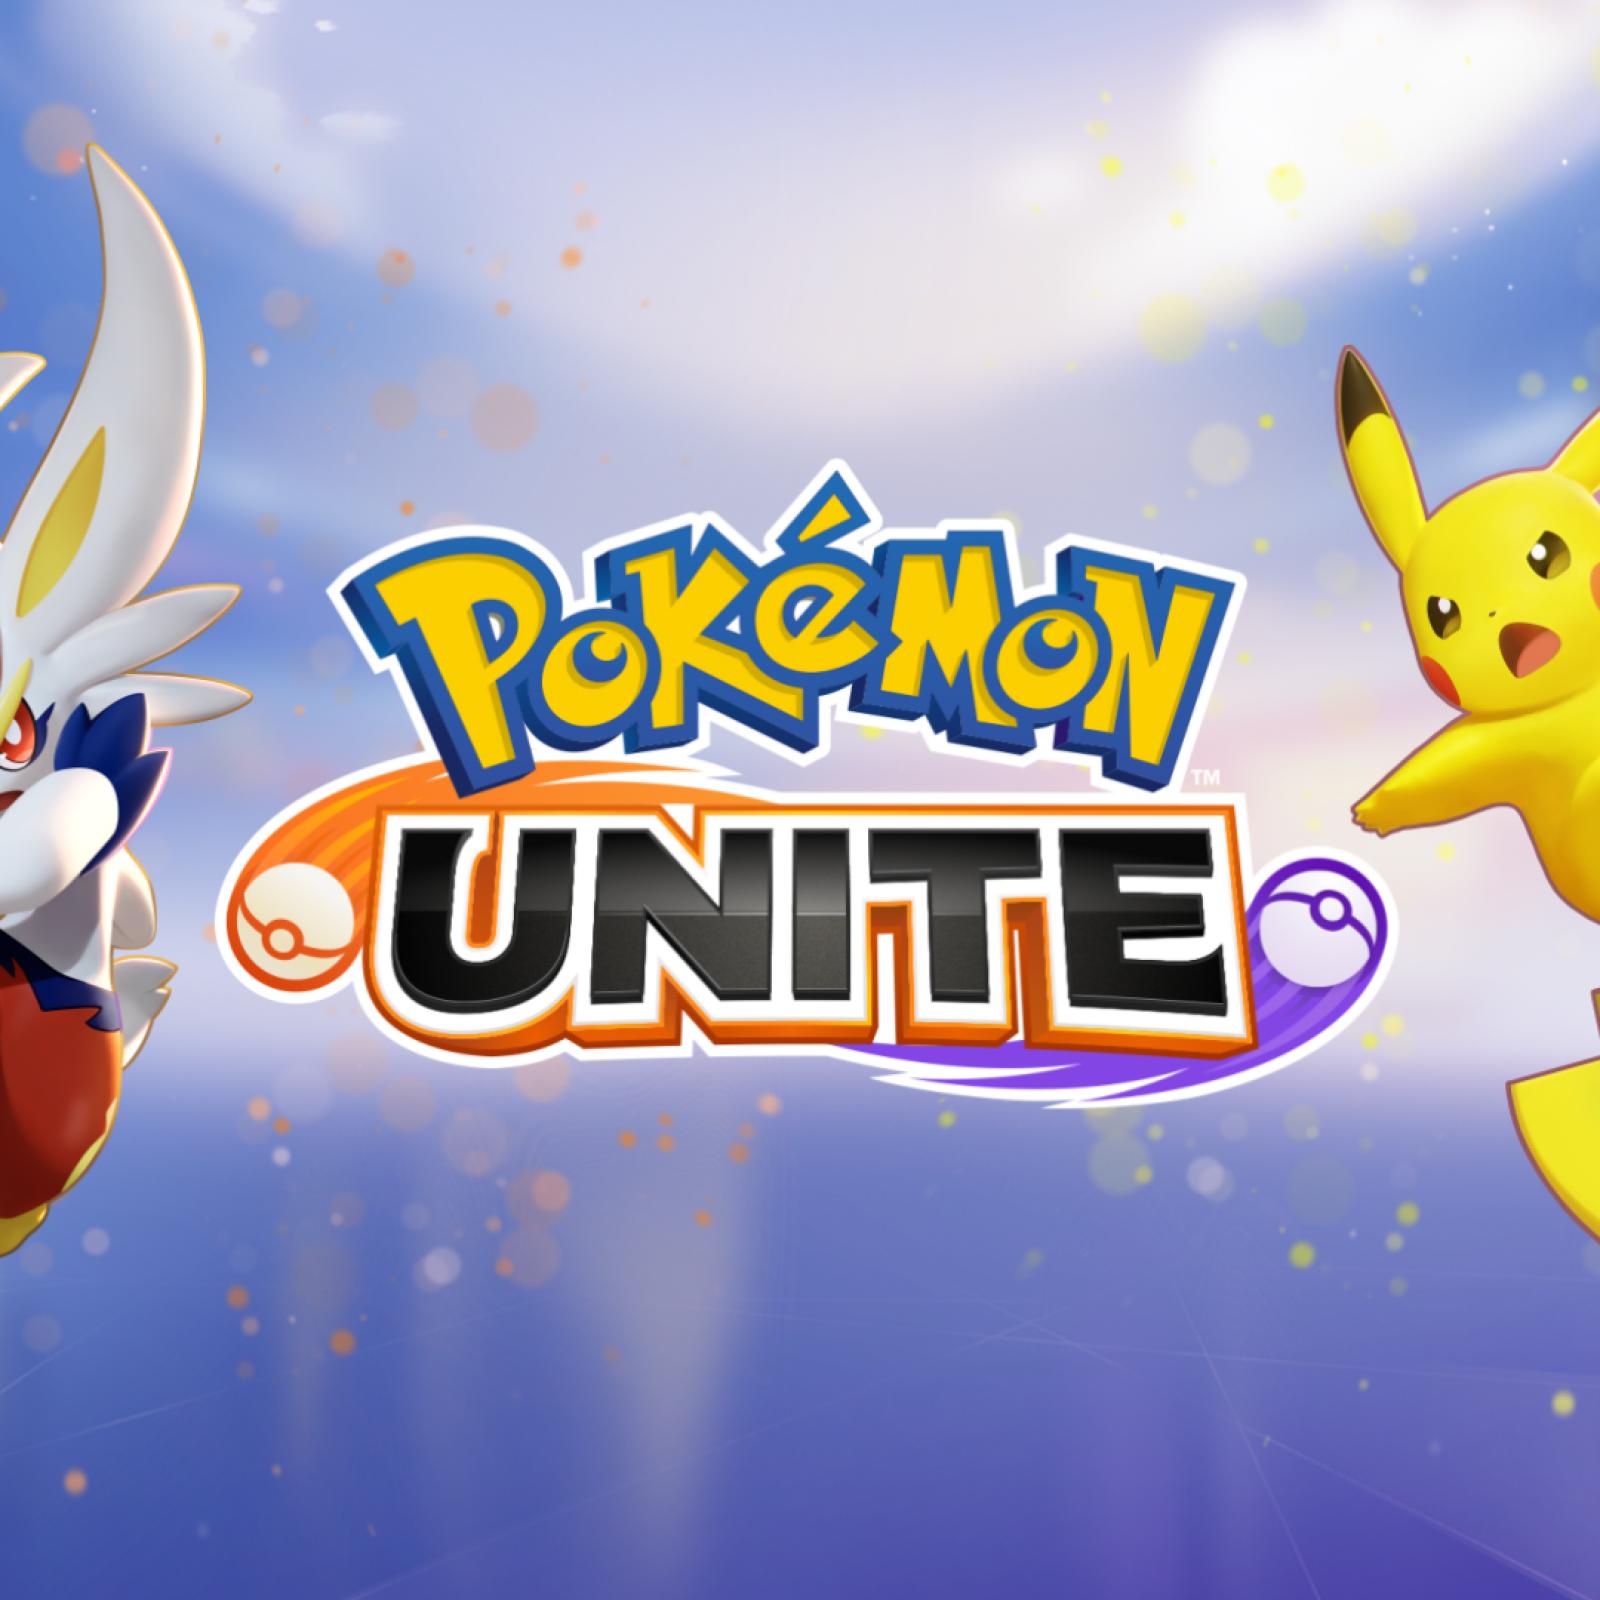 Pokemon Unite Nintendo Switch Release Date And Price Revealed